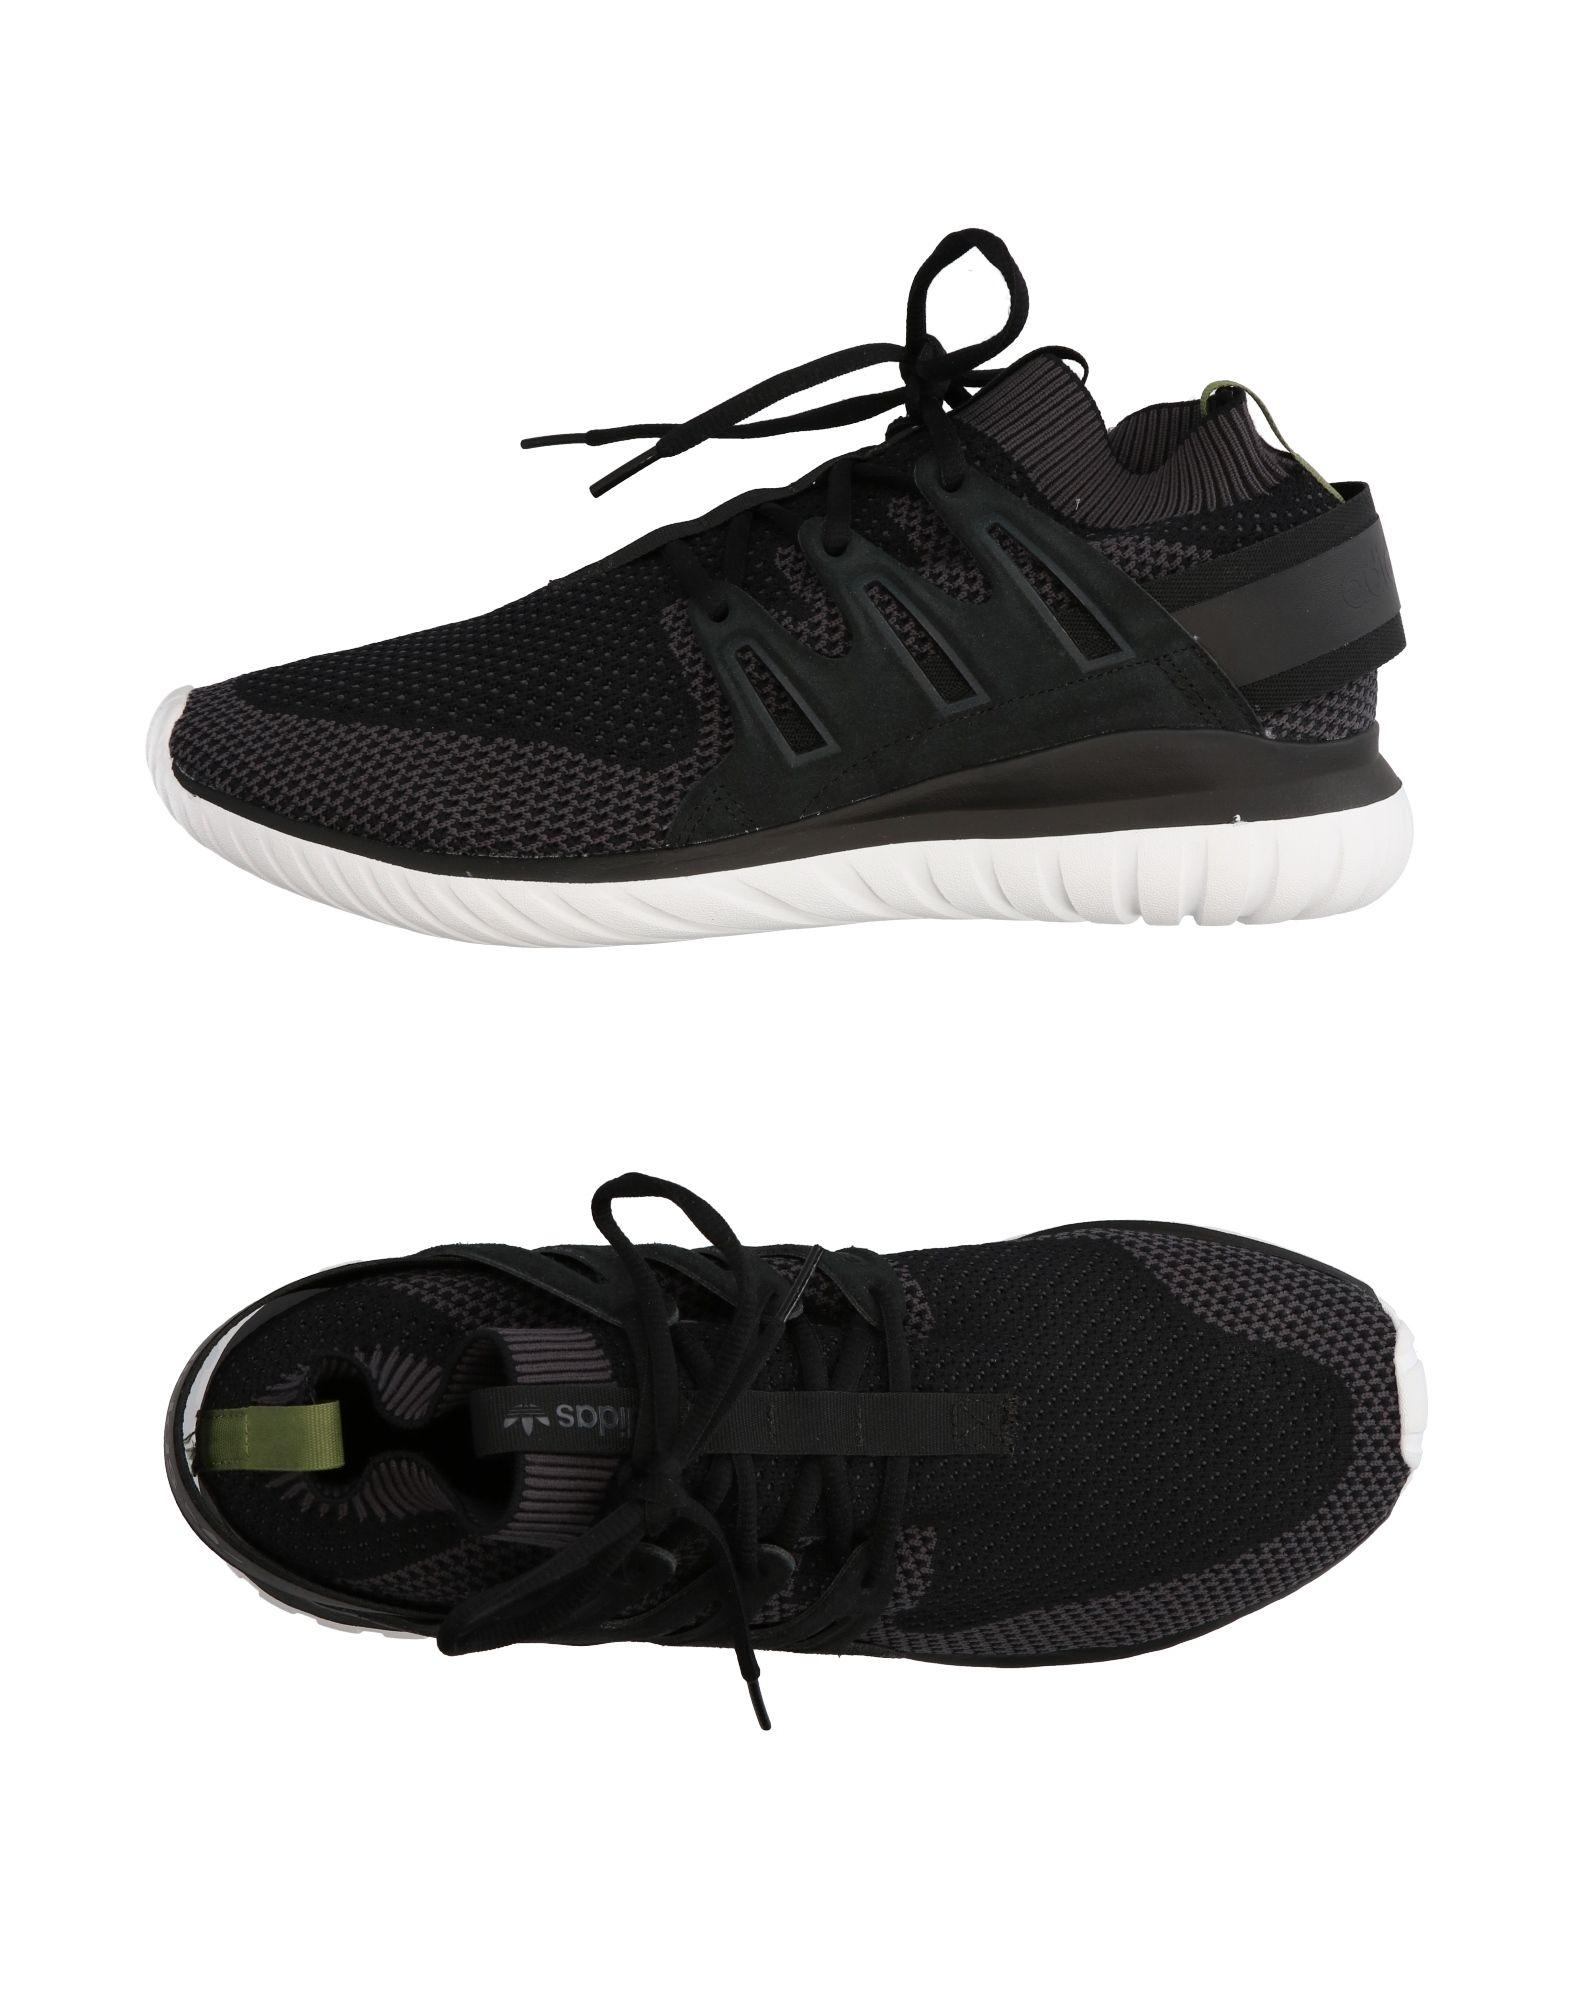 Rabatt echte Schuhe Adidas Originals 11286881BP Turnschuhes Herren 11286881BP Originals d826bd